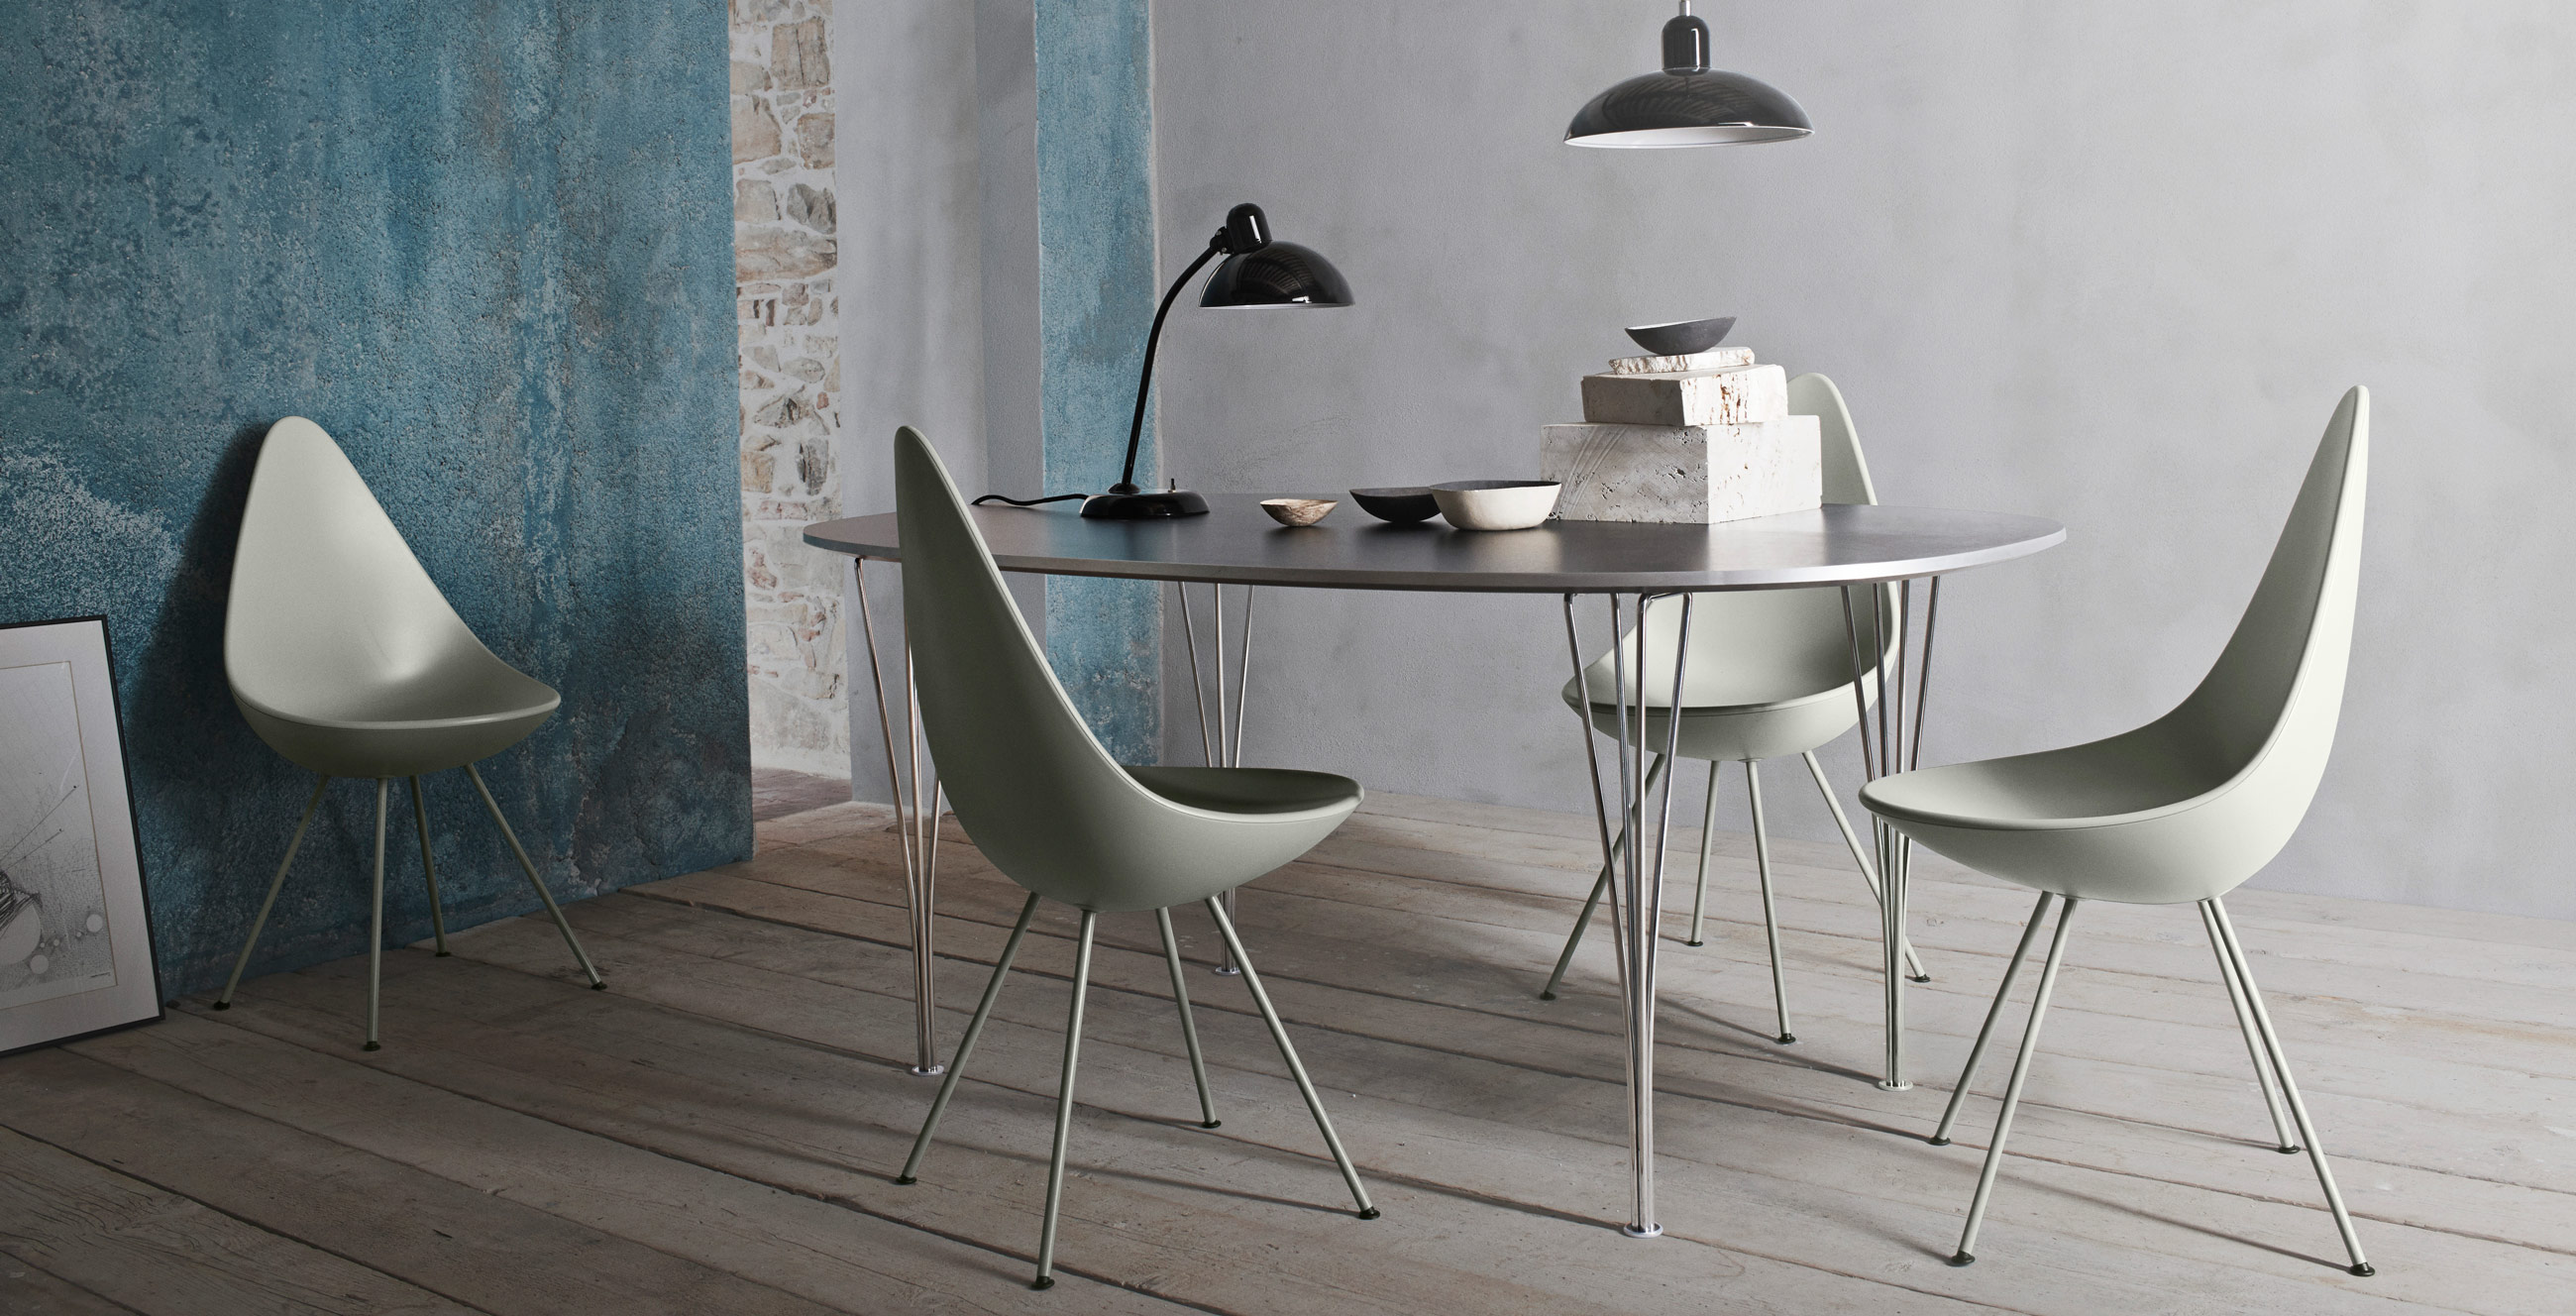 Fritz Hansen Super Elliptical Table Grey Laminate & Chrome Base with Drop Chairs